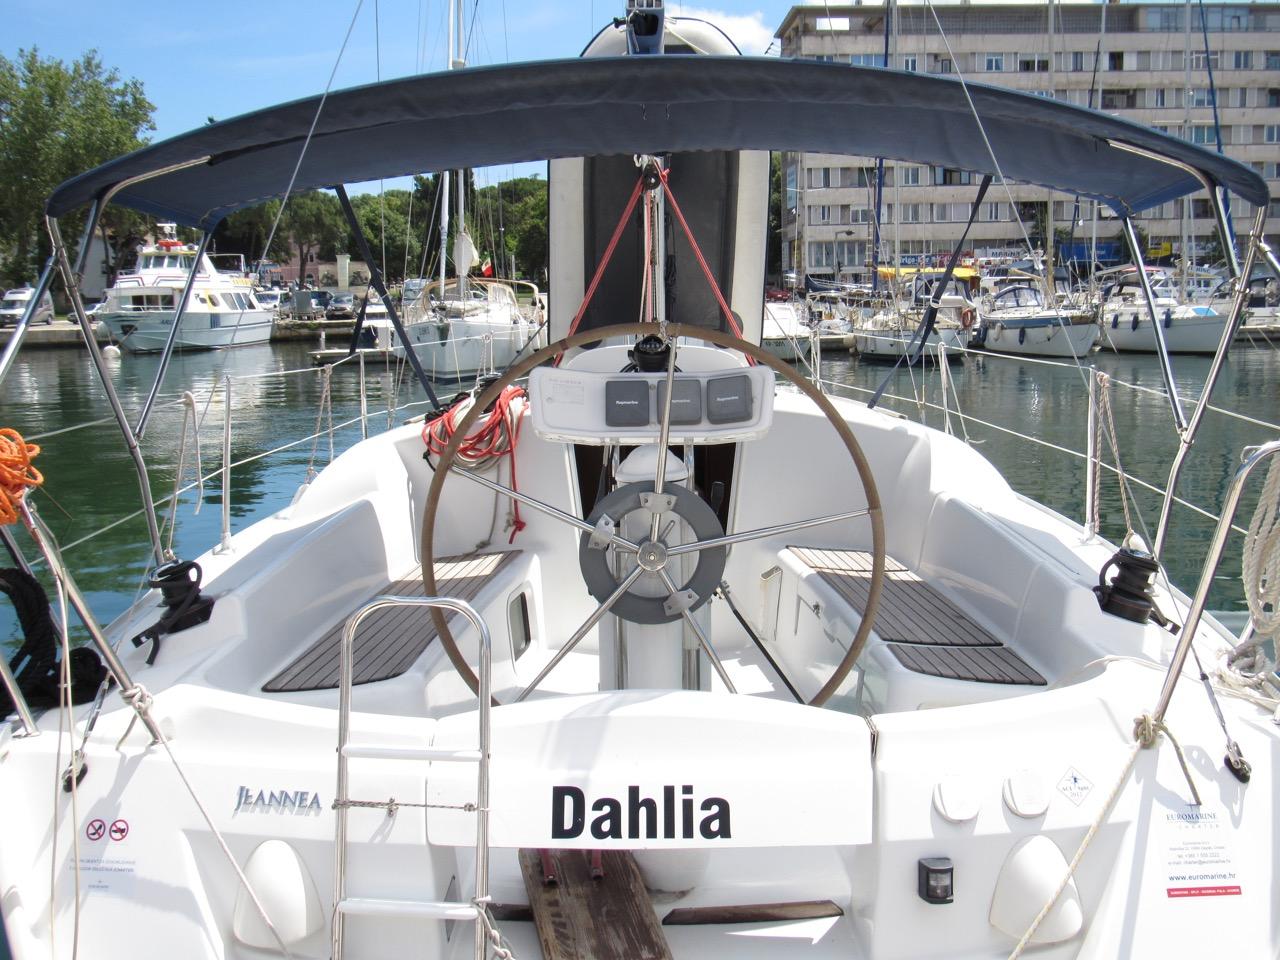 Sun Odyssey 32i, Dahlia